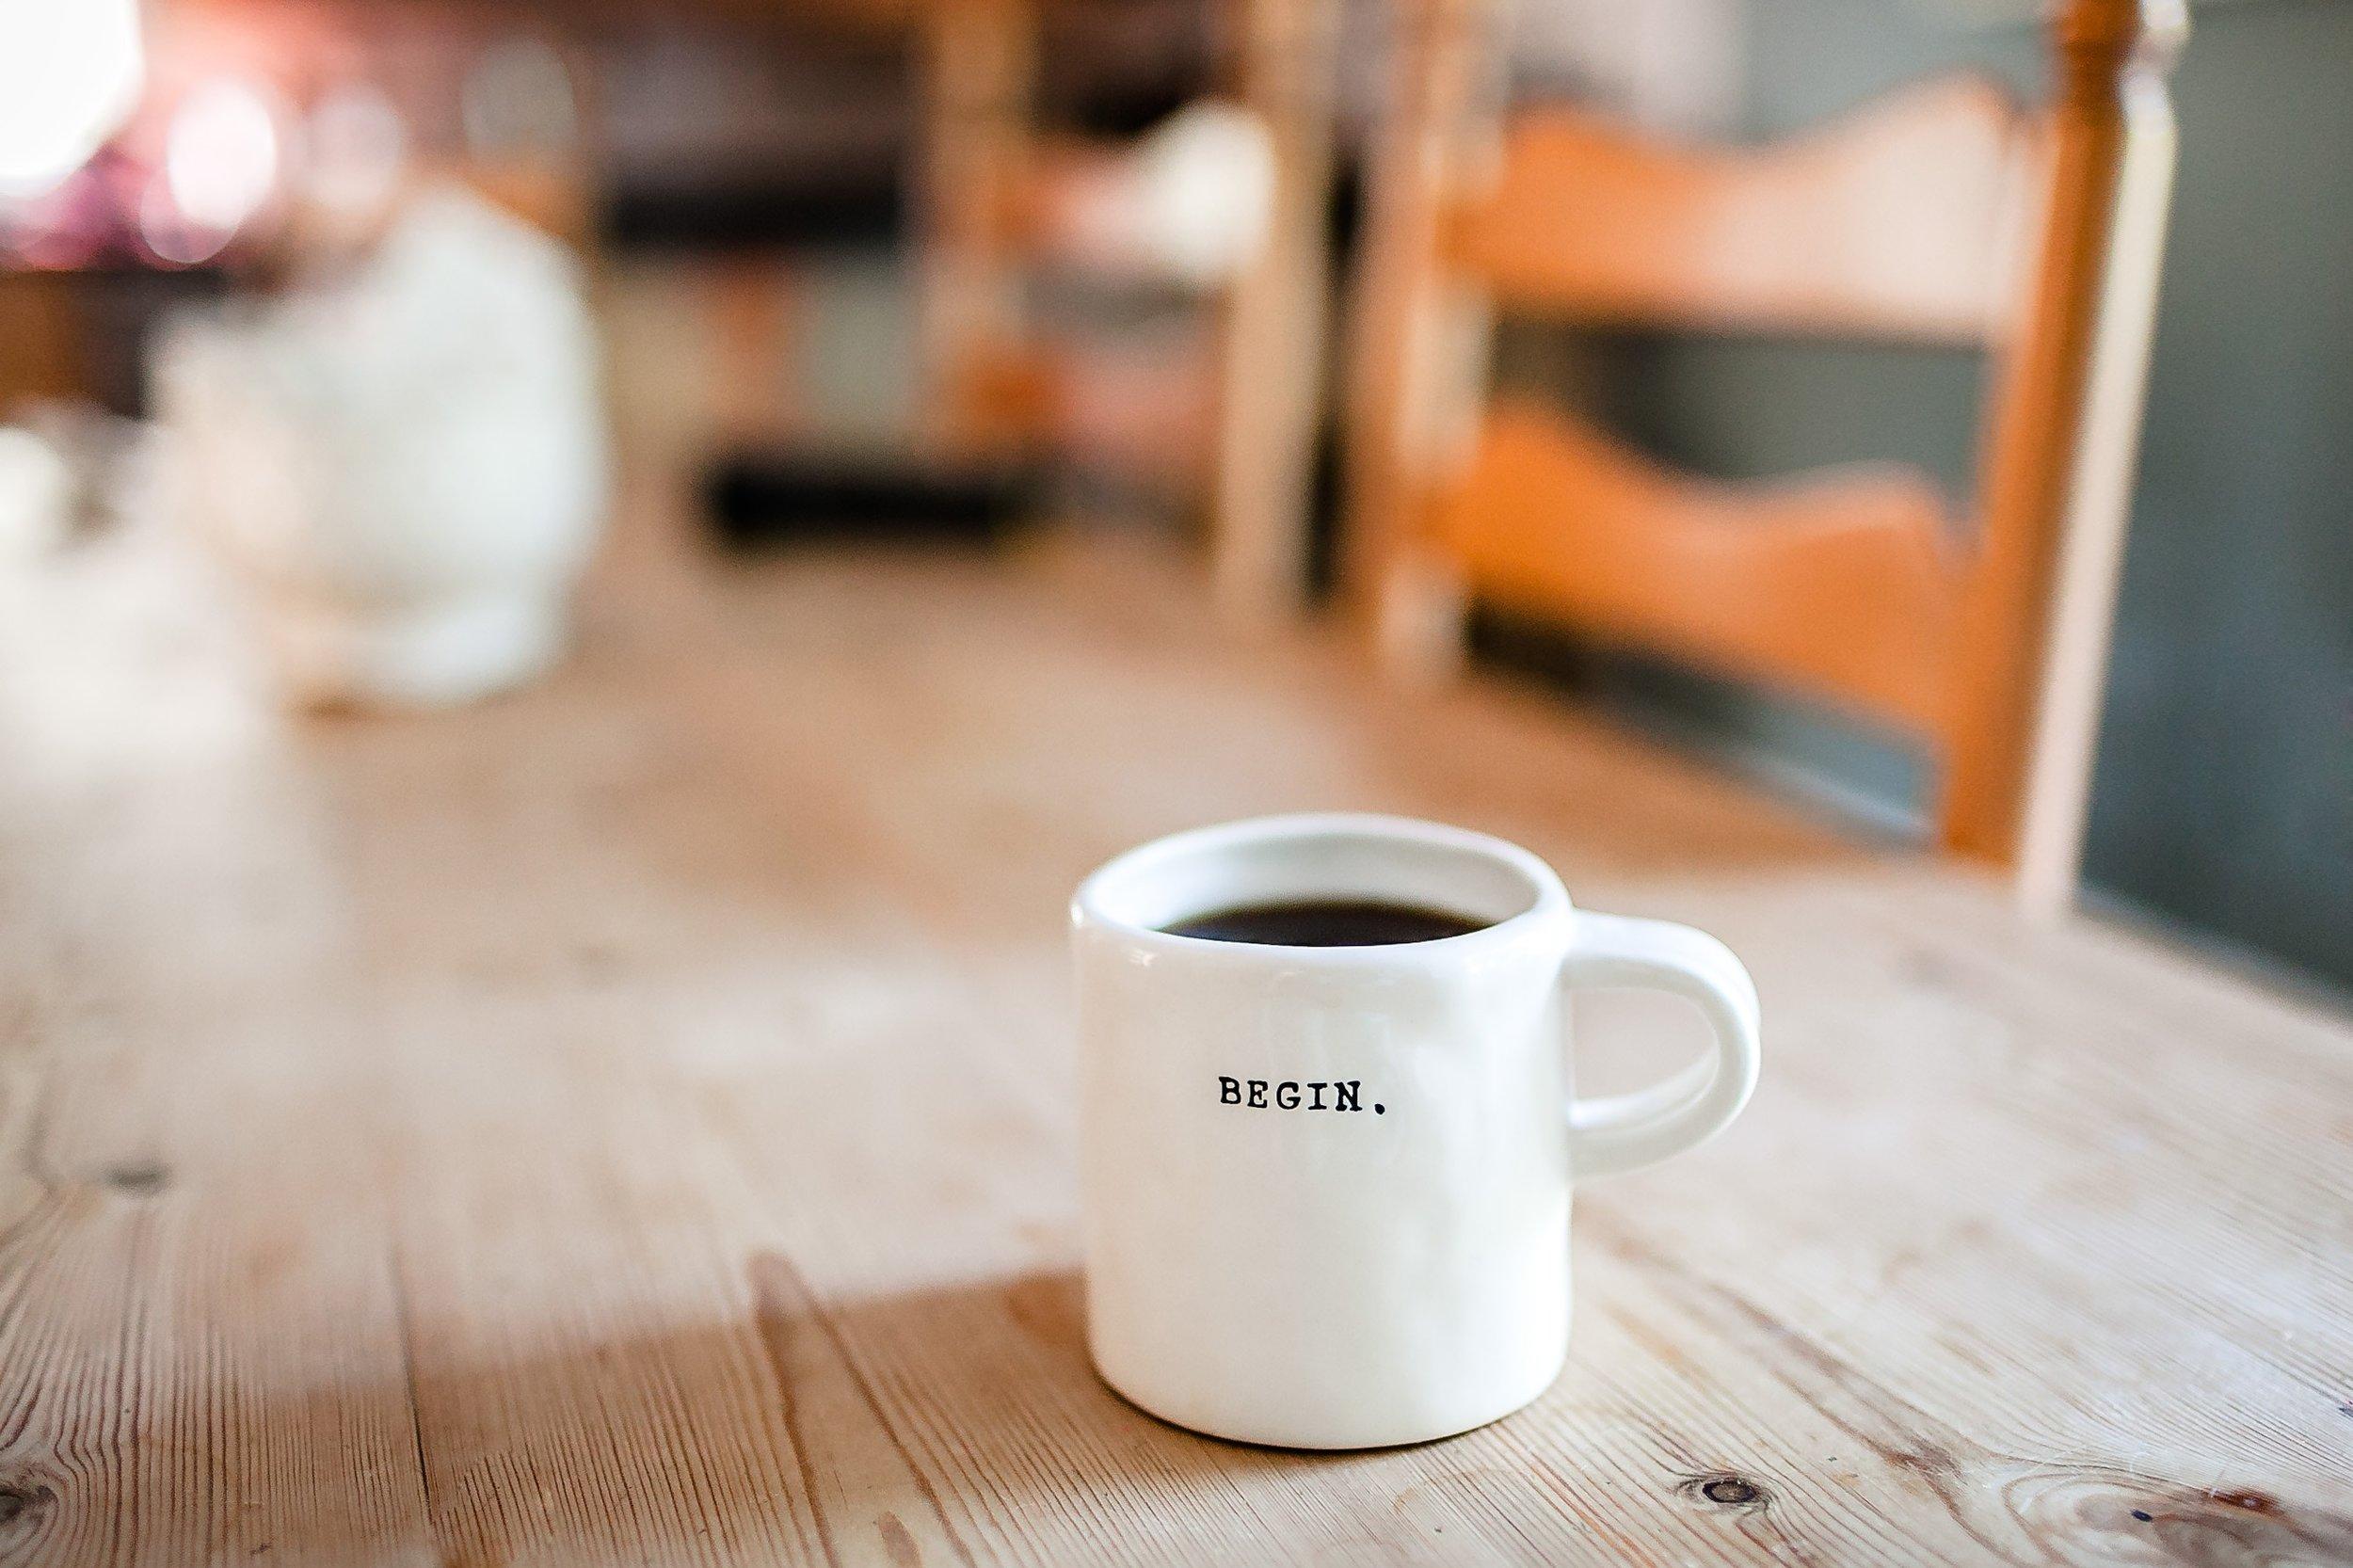 coffee-boost-metabolism